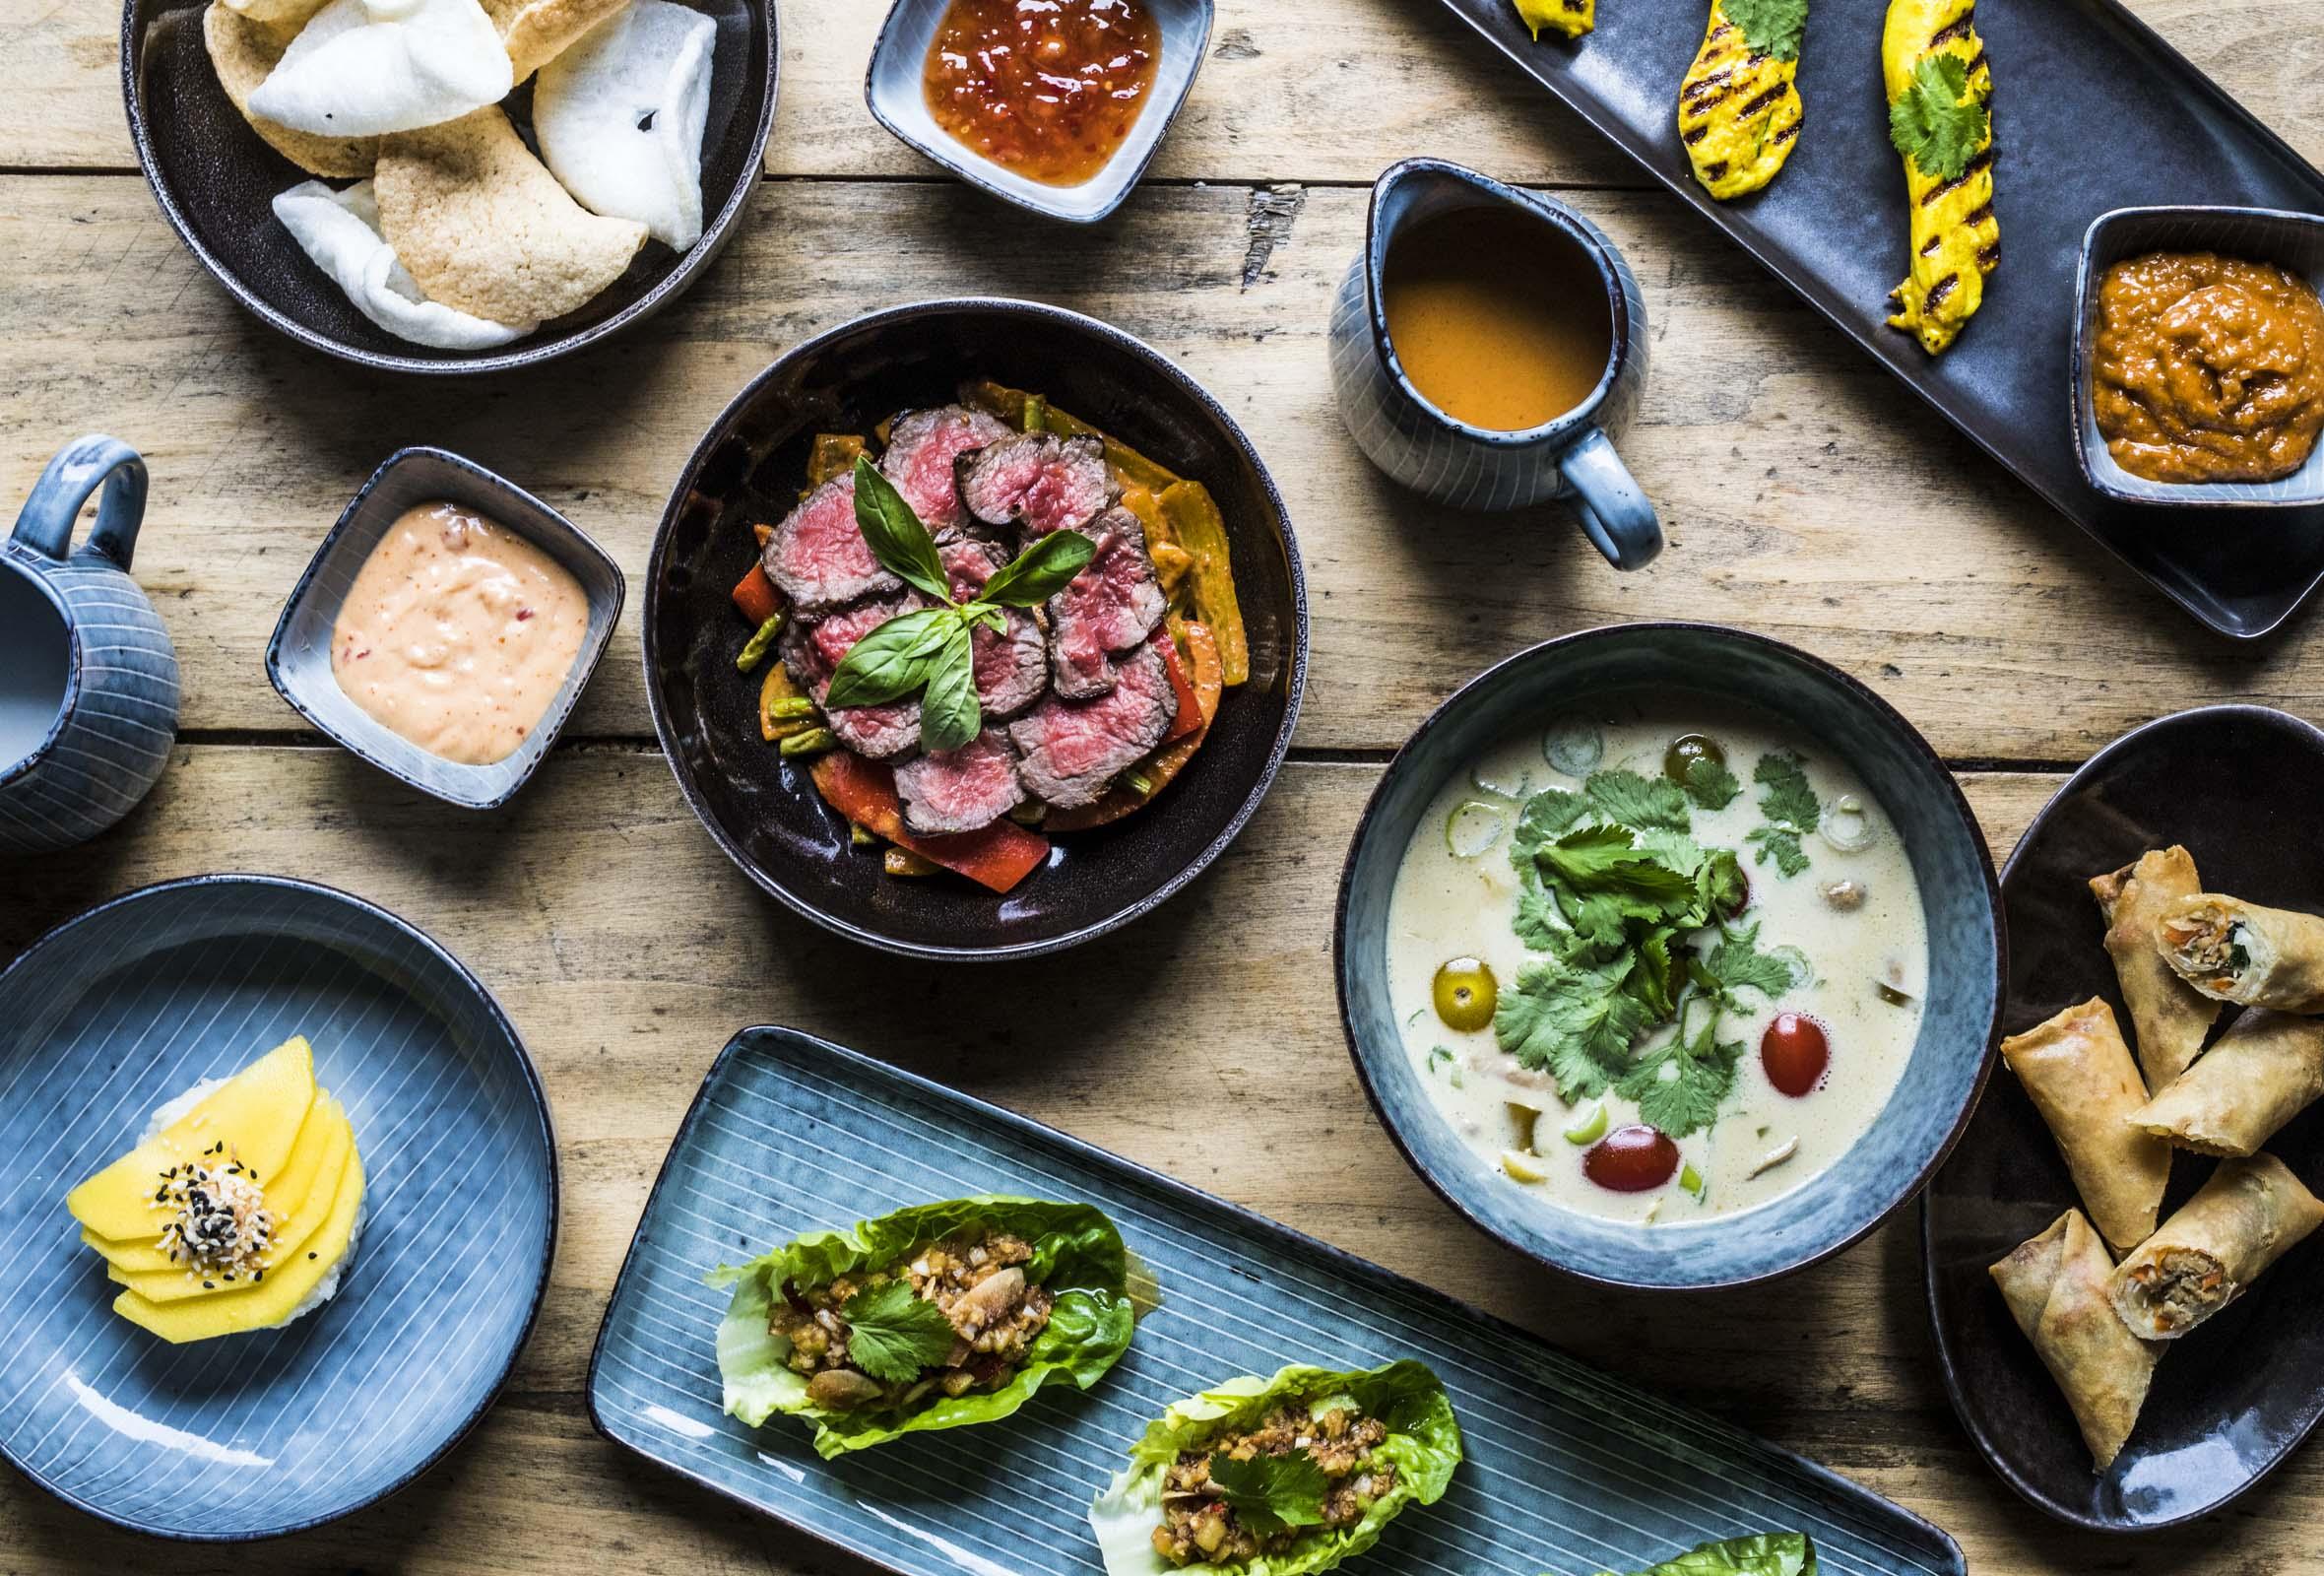 8 serveringer hos Lolly i Indre By – Ny restaurant byder på overdådige thai-retter, cocktails og bløde vibes